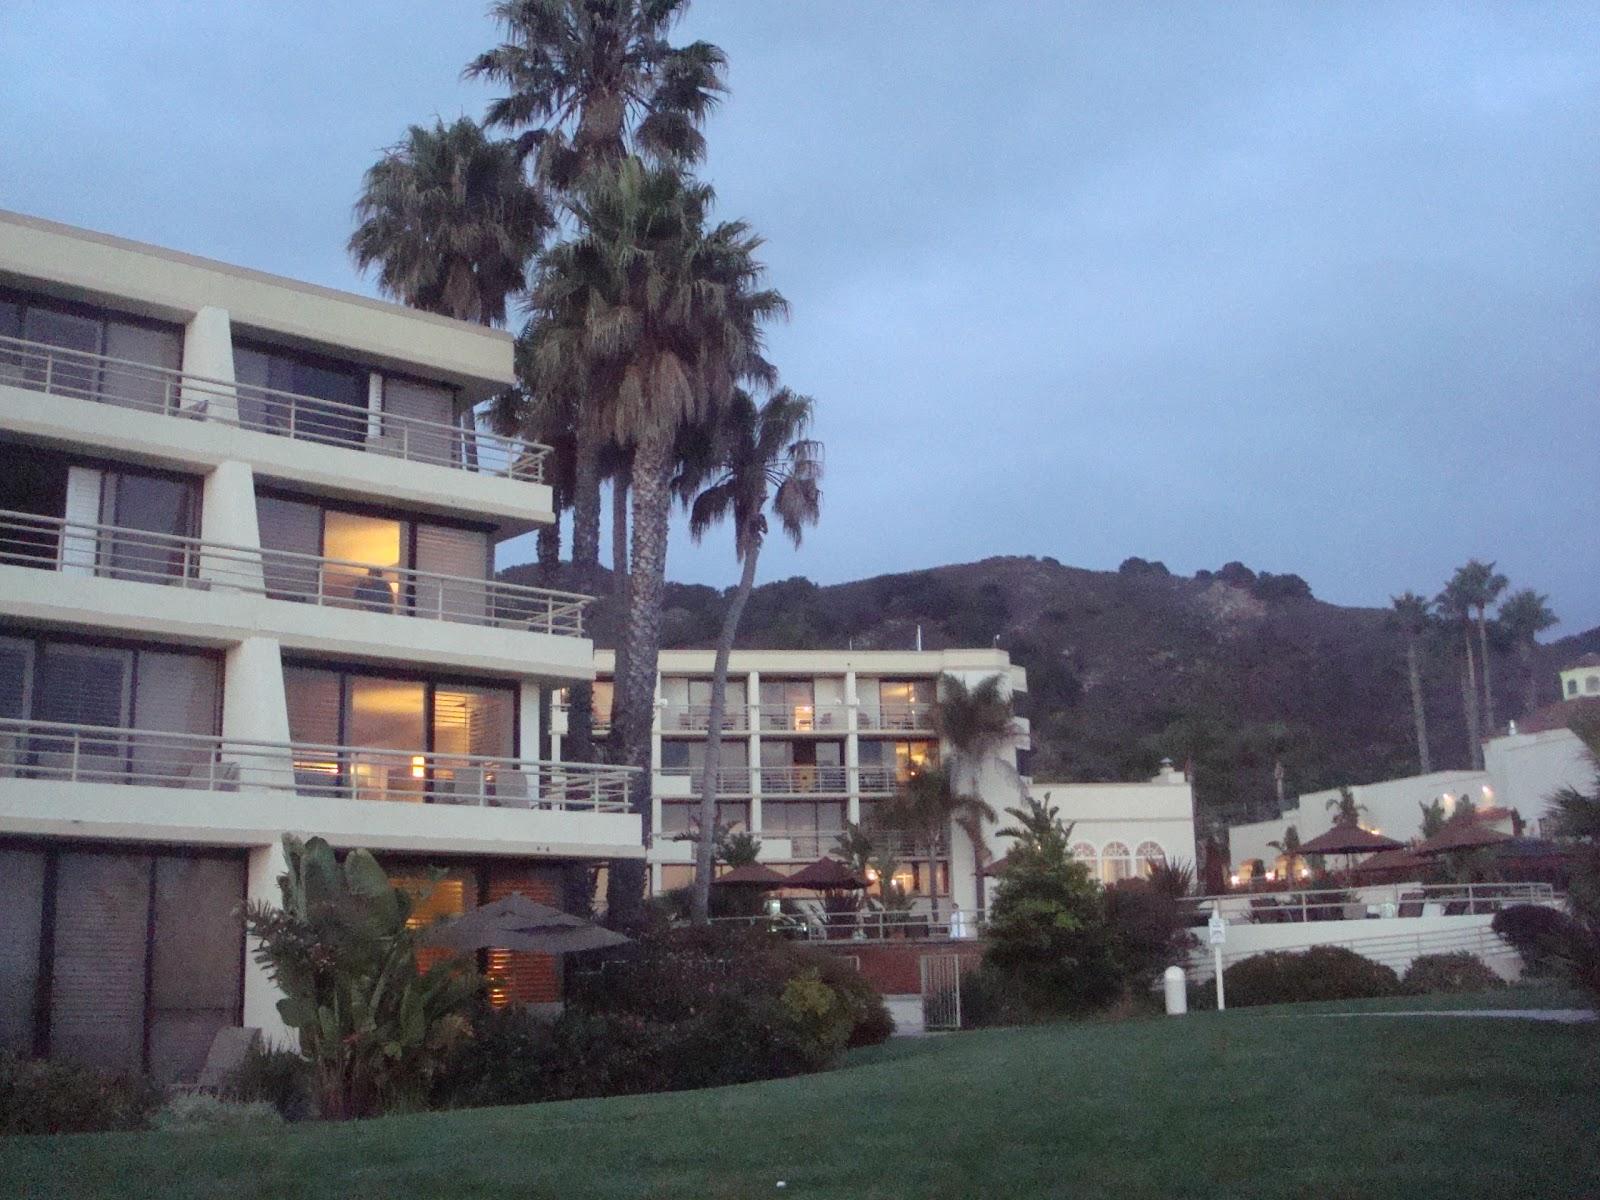 The Cliffs Resort and Spa in Pismo Beach – CUISINEIST